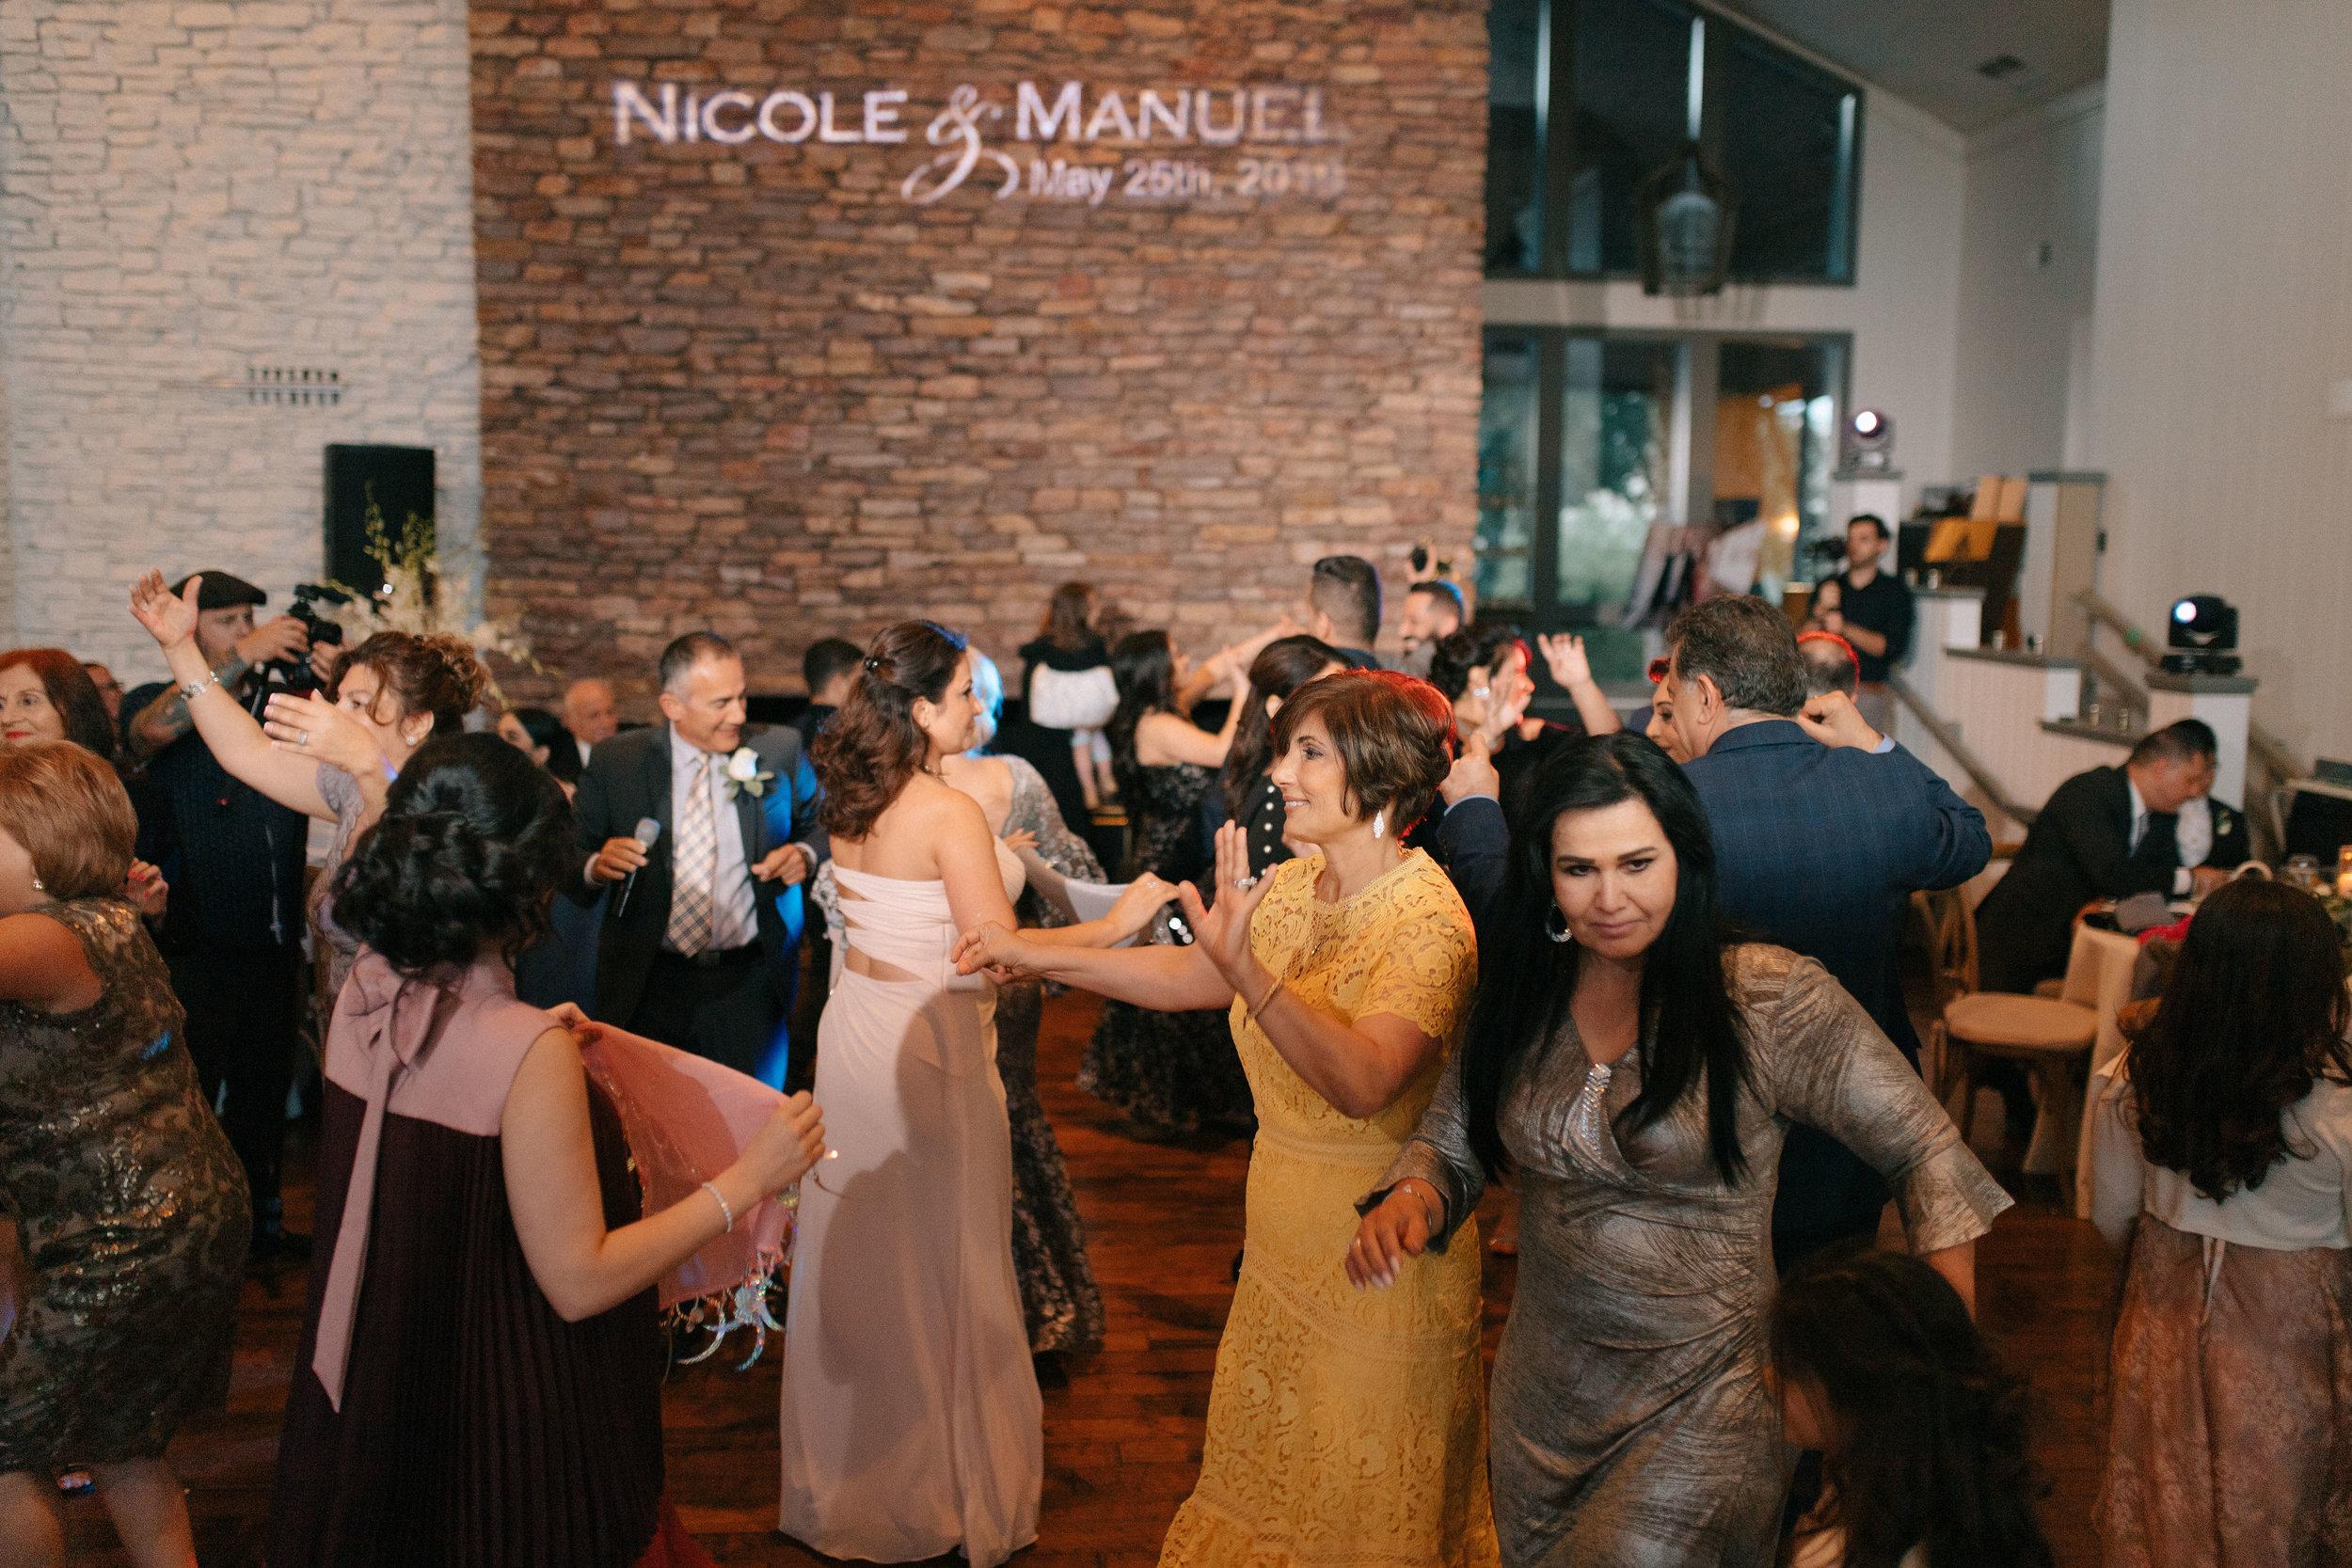 052519-NicoleManuel-SarahChingPhoto-730.jpg